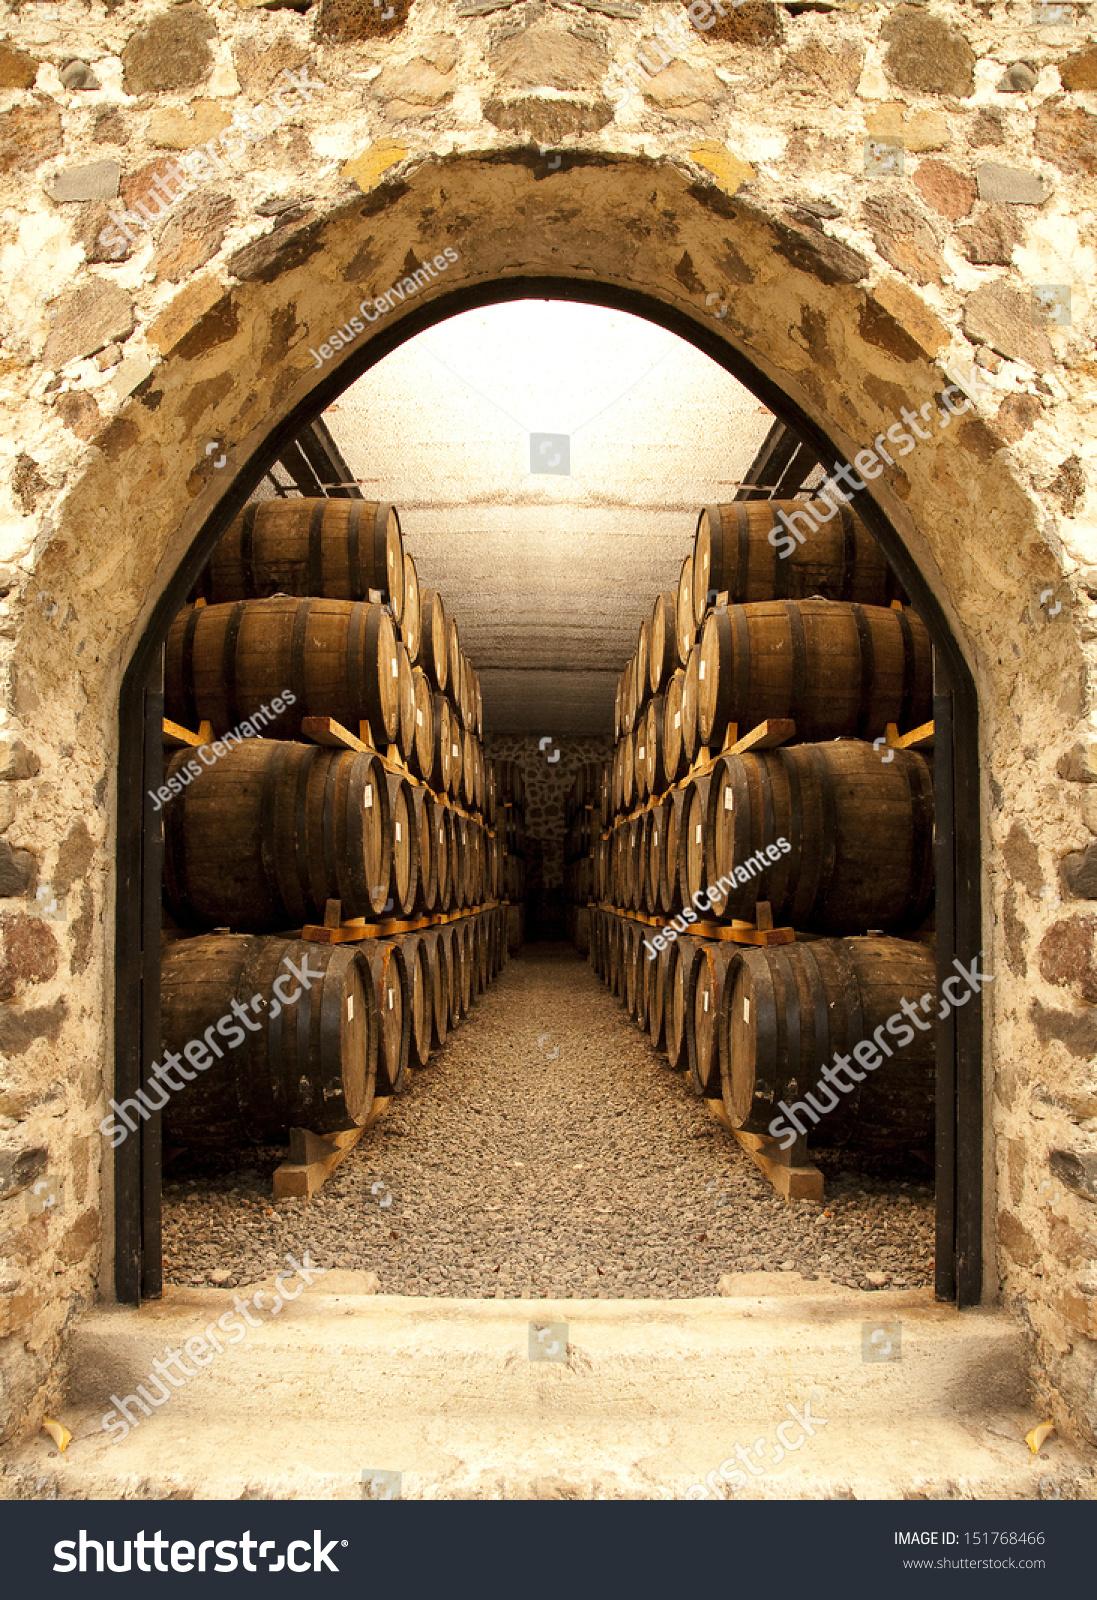 Barrels in a hungarian wine cellar - Custom Wallpaper   Barrel Wine Cellar